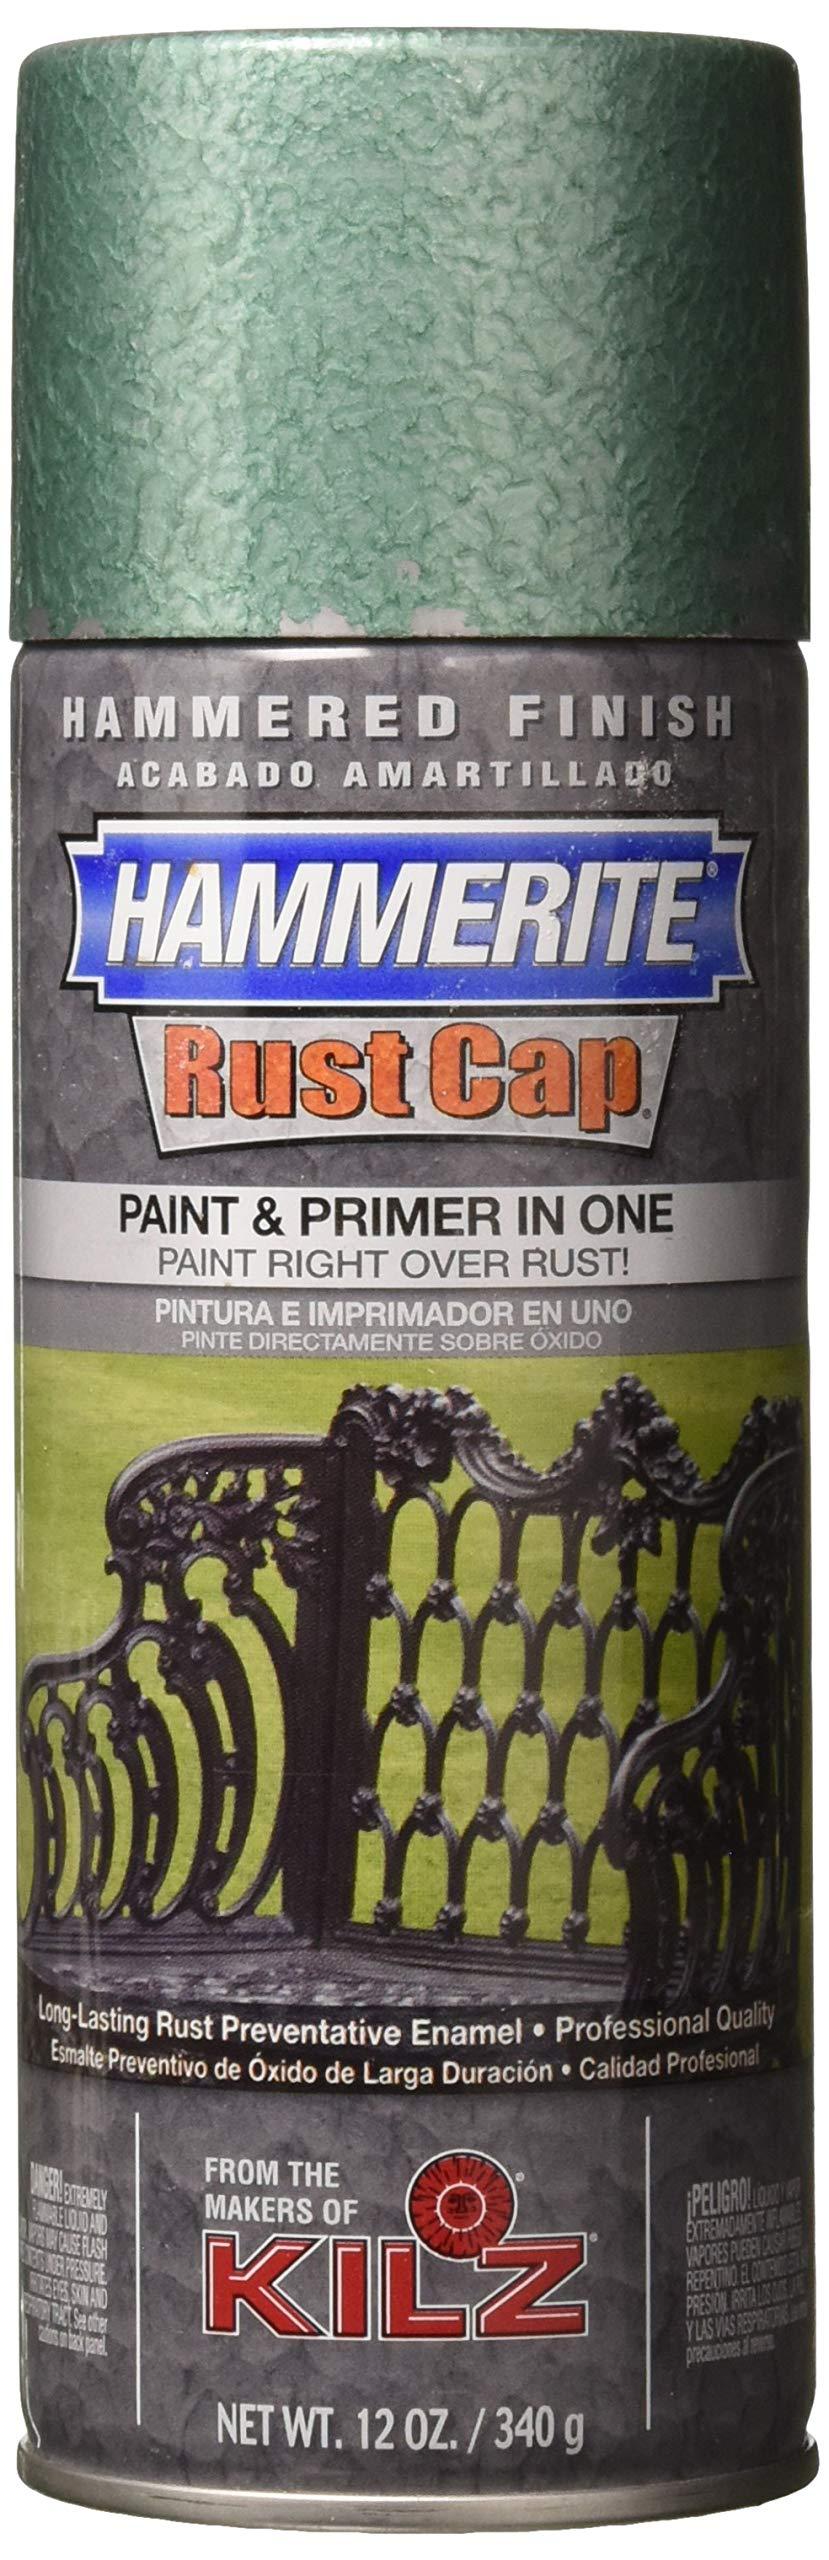 Hammerite Rust Cap 2668 41175 Enamel, 12 Oz Aerosol Can, 18 Sq-Ft/Gal, Mid, Hammered Finish